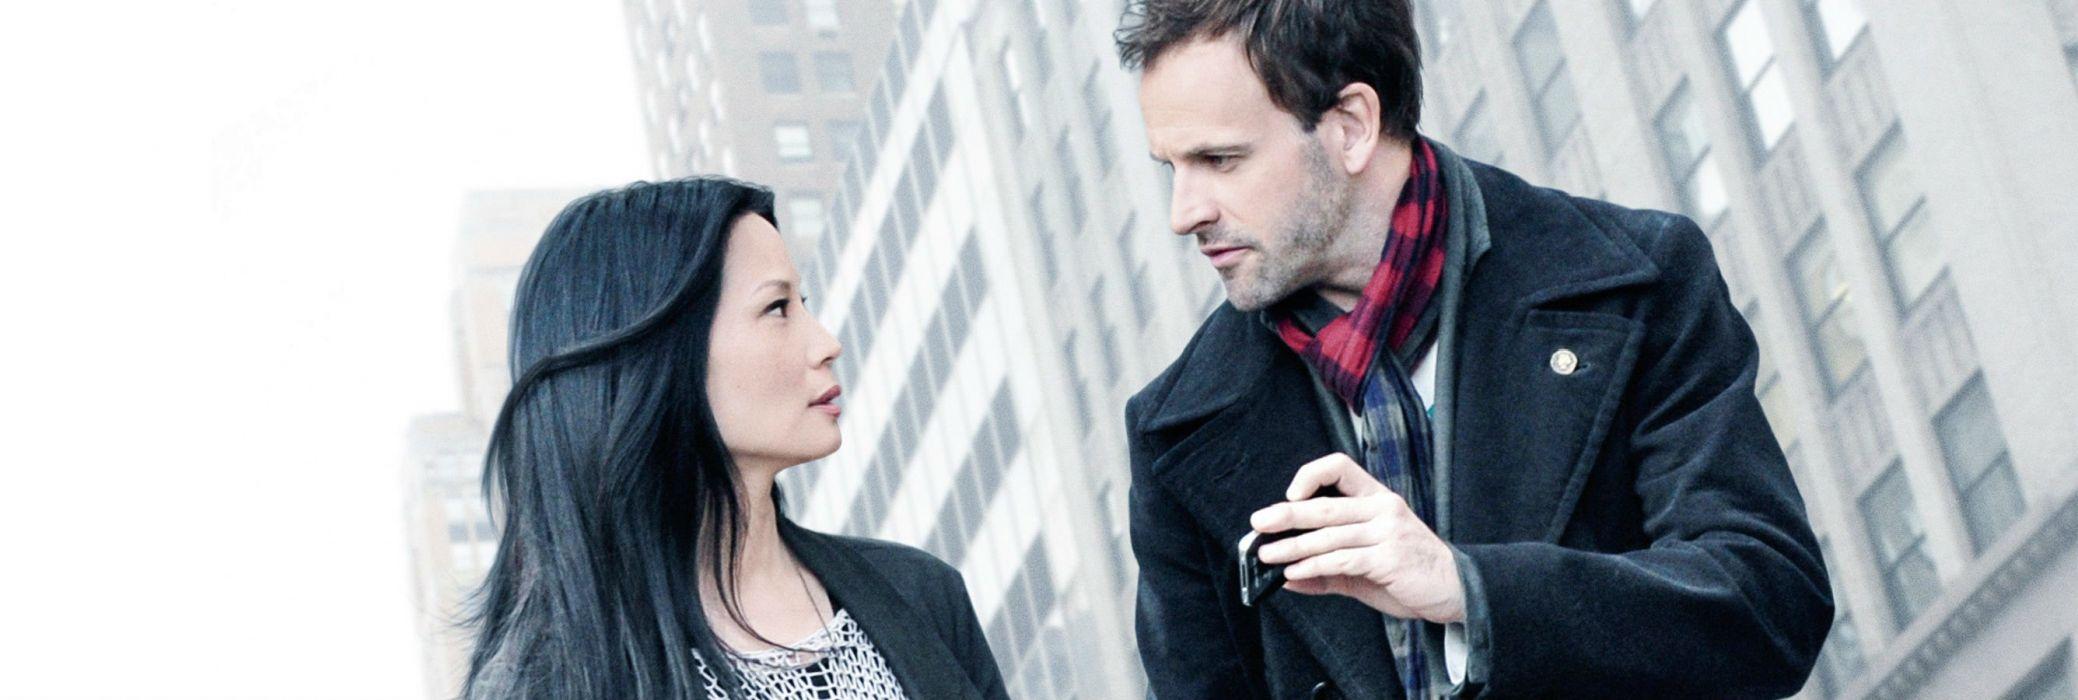 ELEMENTARY series crime drama mystery lucy liu wallpaper